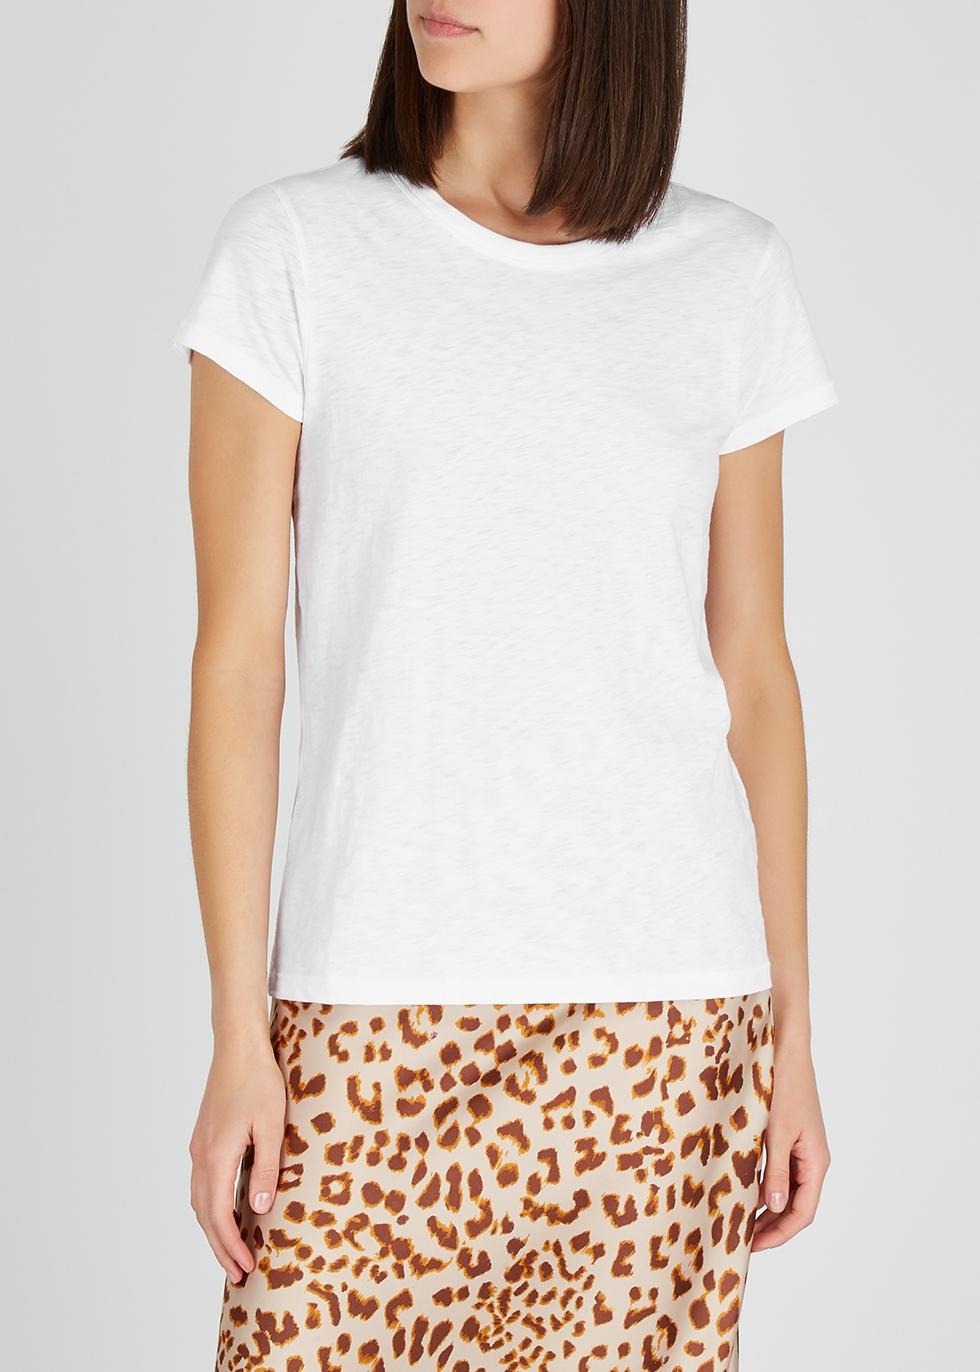 The Tee white cotton T-shirt - rag & bone